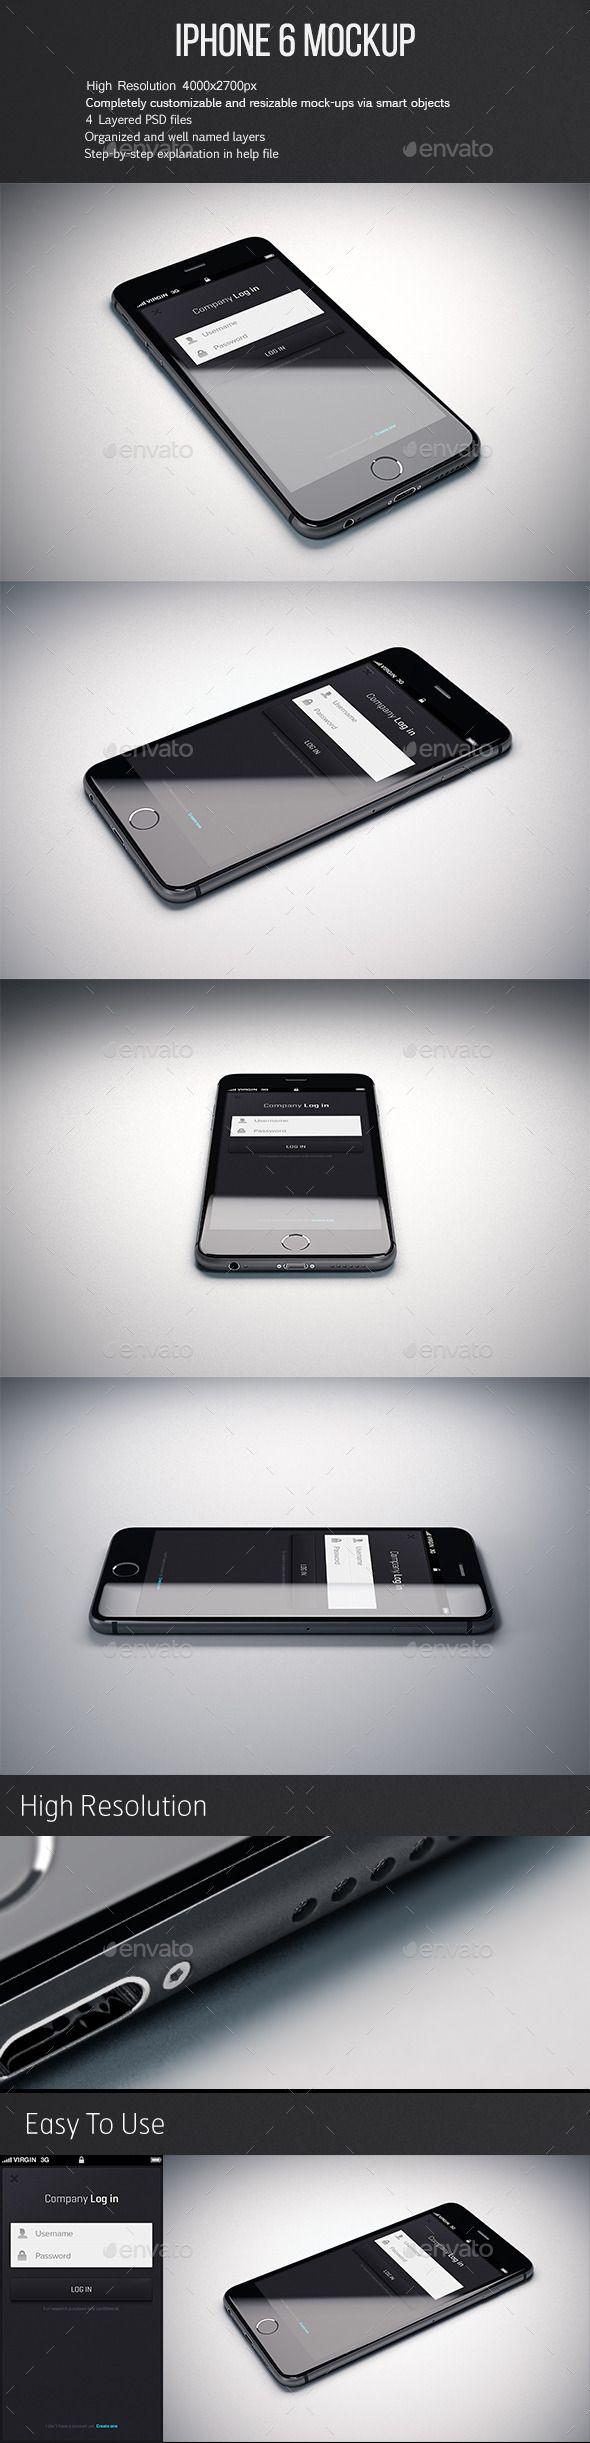 Iphone 6 Mockup #design Download: http://graphicriver.net/item/phone-6-mockup/12729261?ref=ksioks